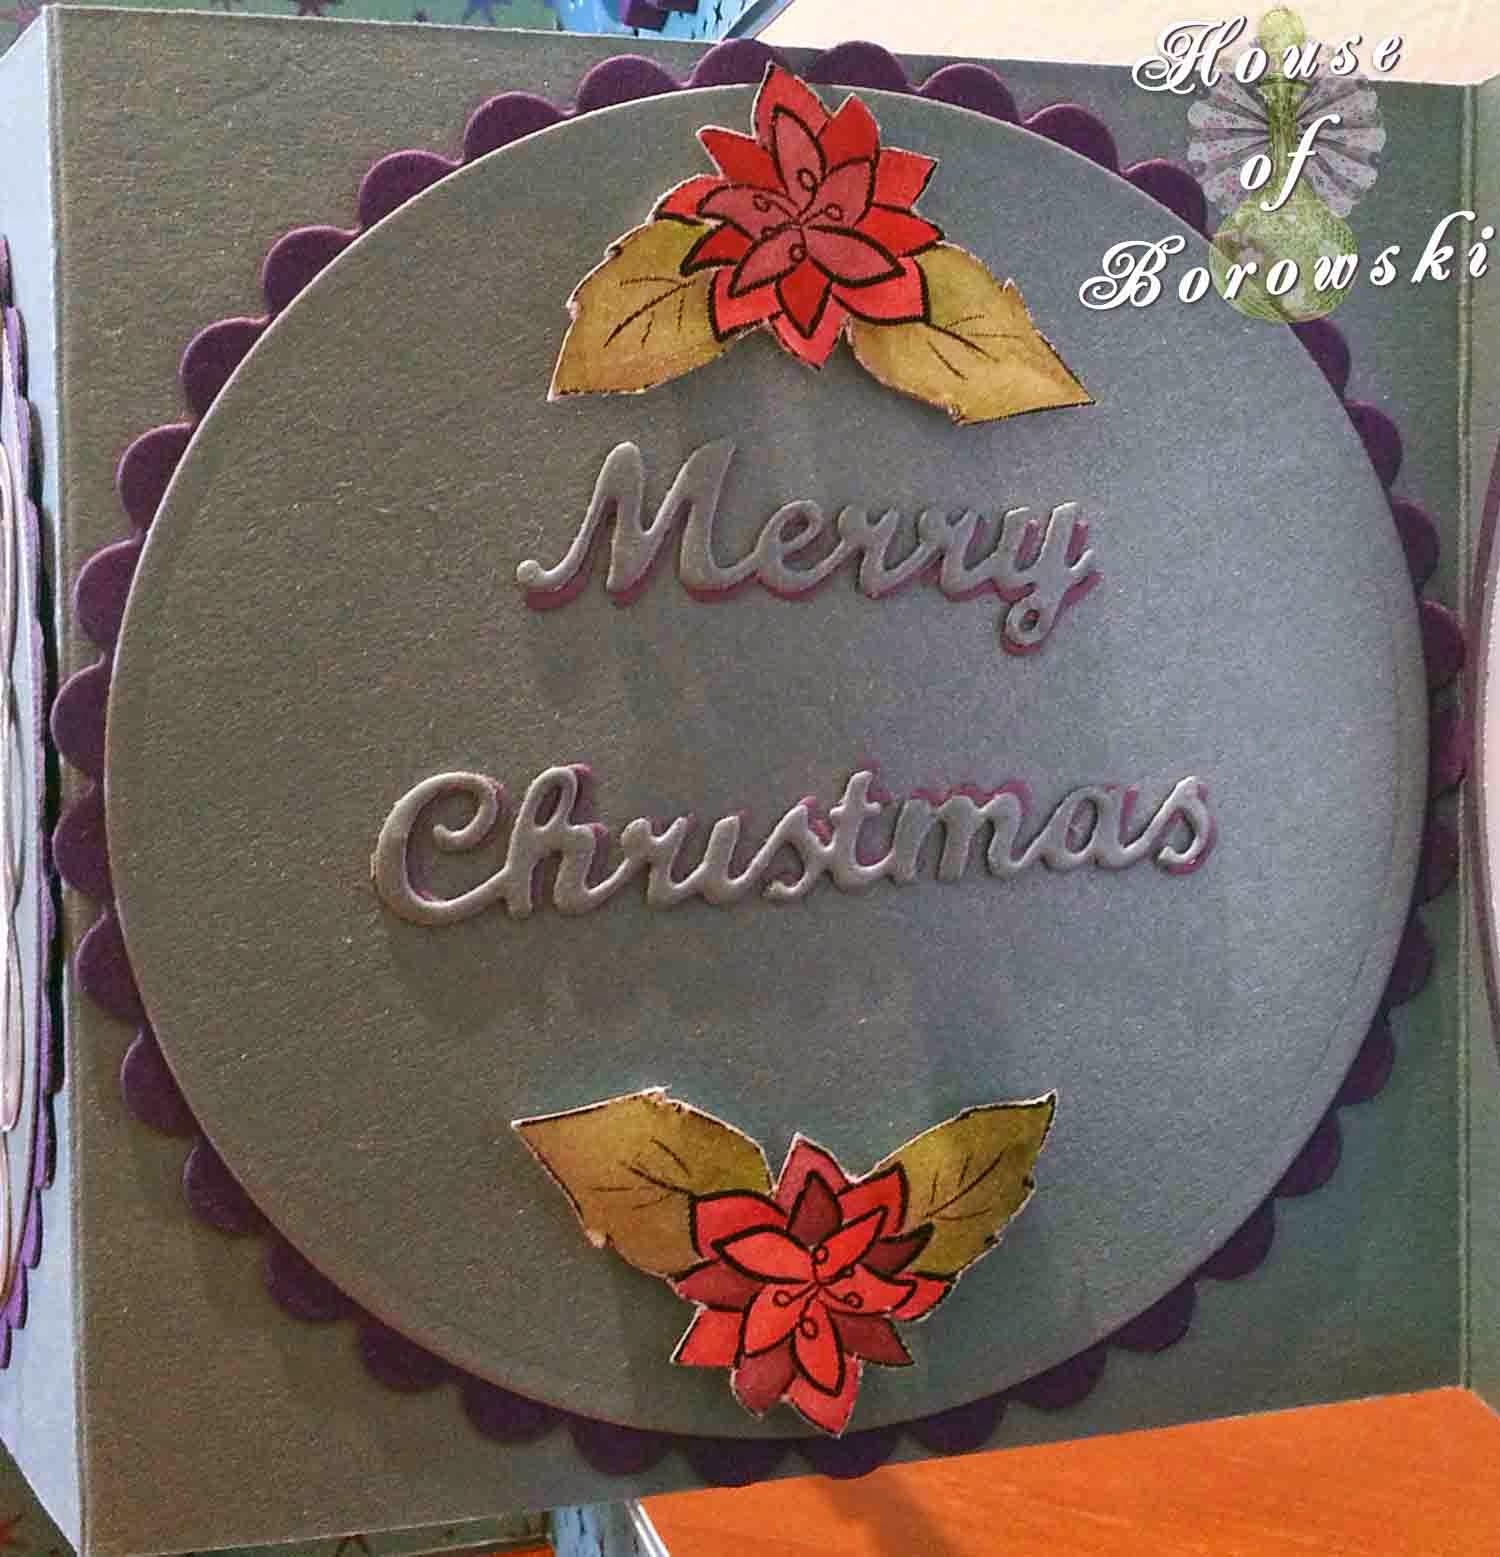 Fitztown, HOB, fitztown winter 4, inktense pencils,spellbinders circles,elizabeth craft merry christmas,kaisercraft,cuttlebug snow fun